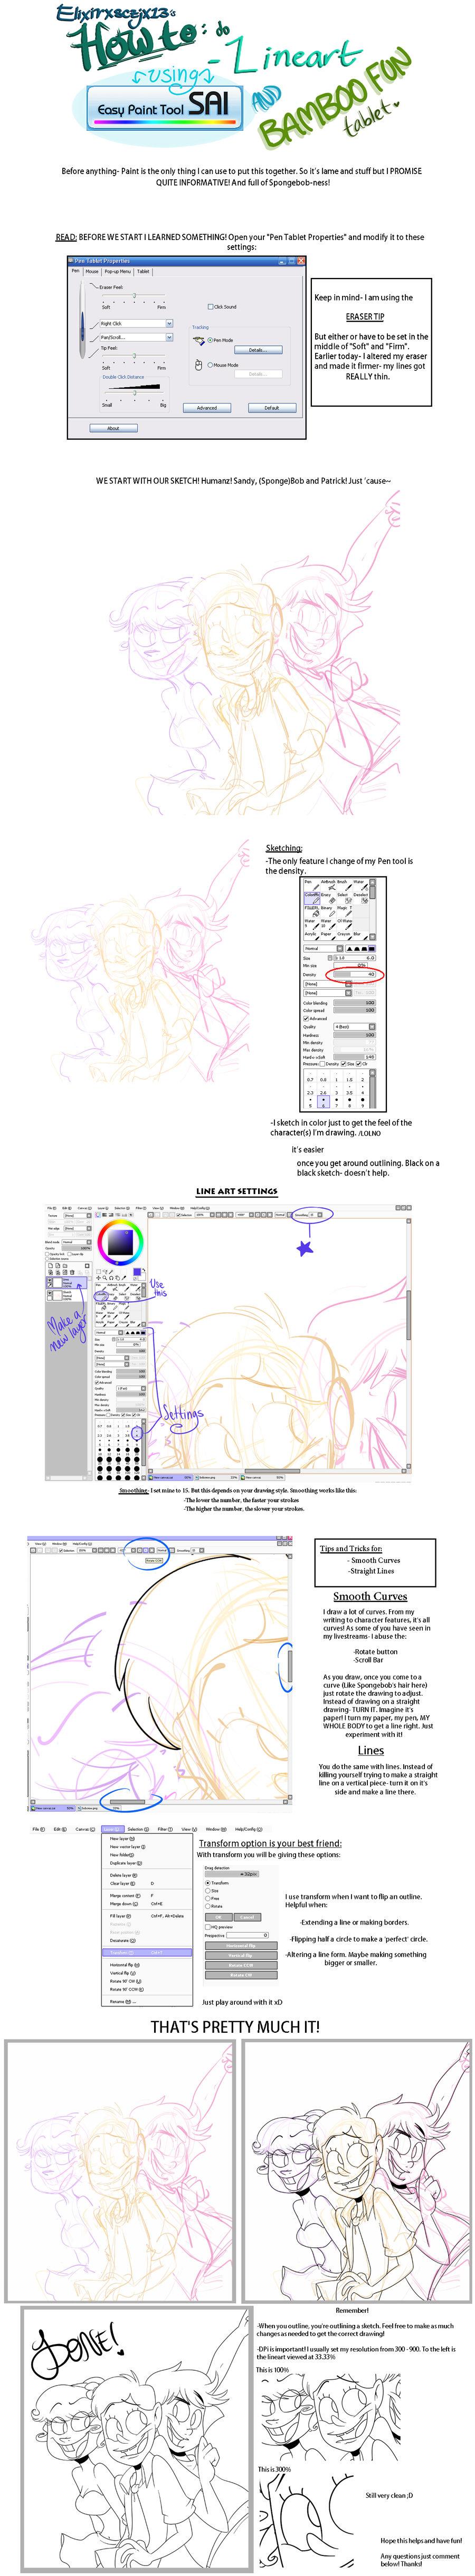 Lineart on Paint Tool Sai by elixirXsczjX13